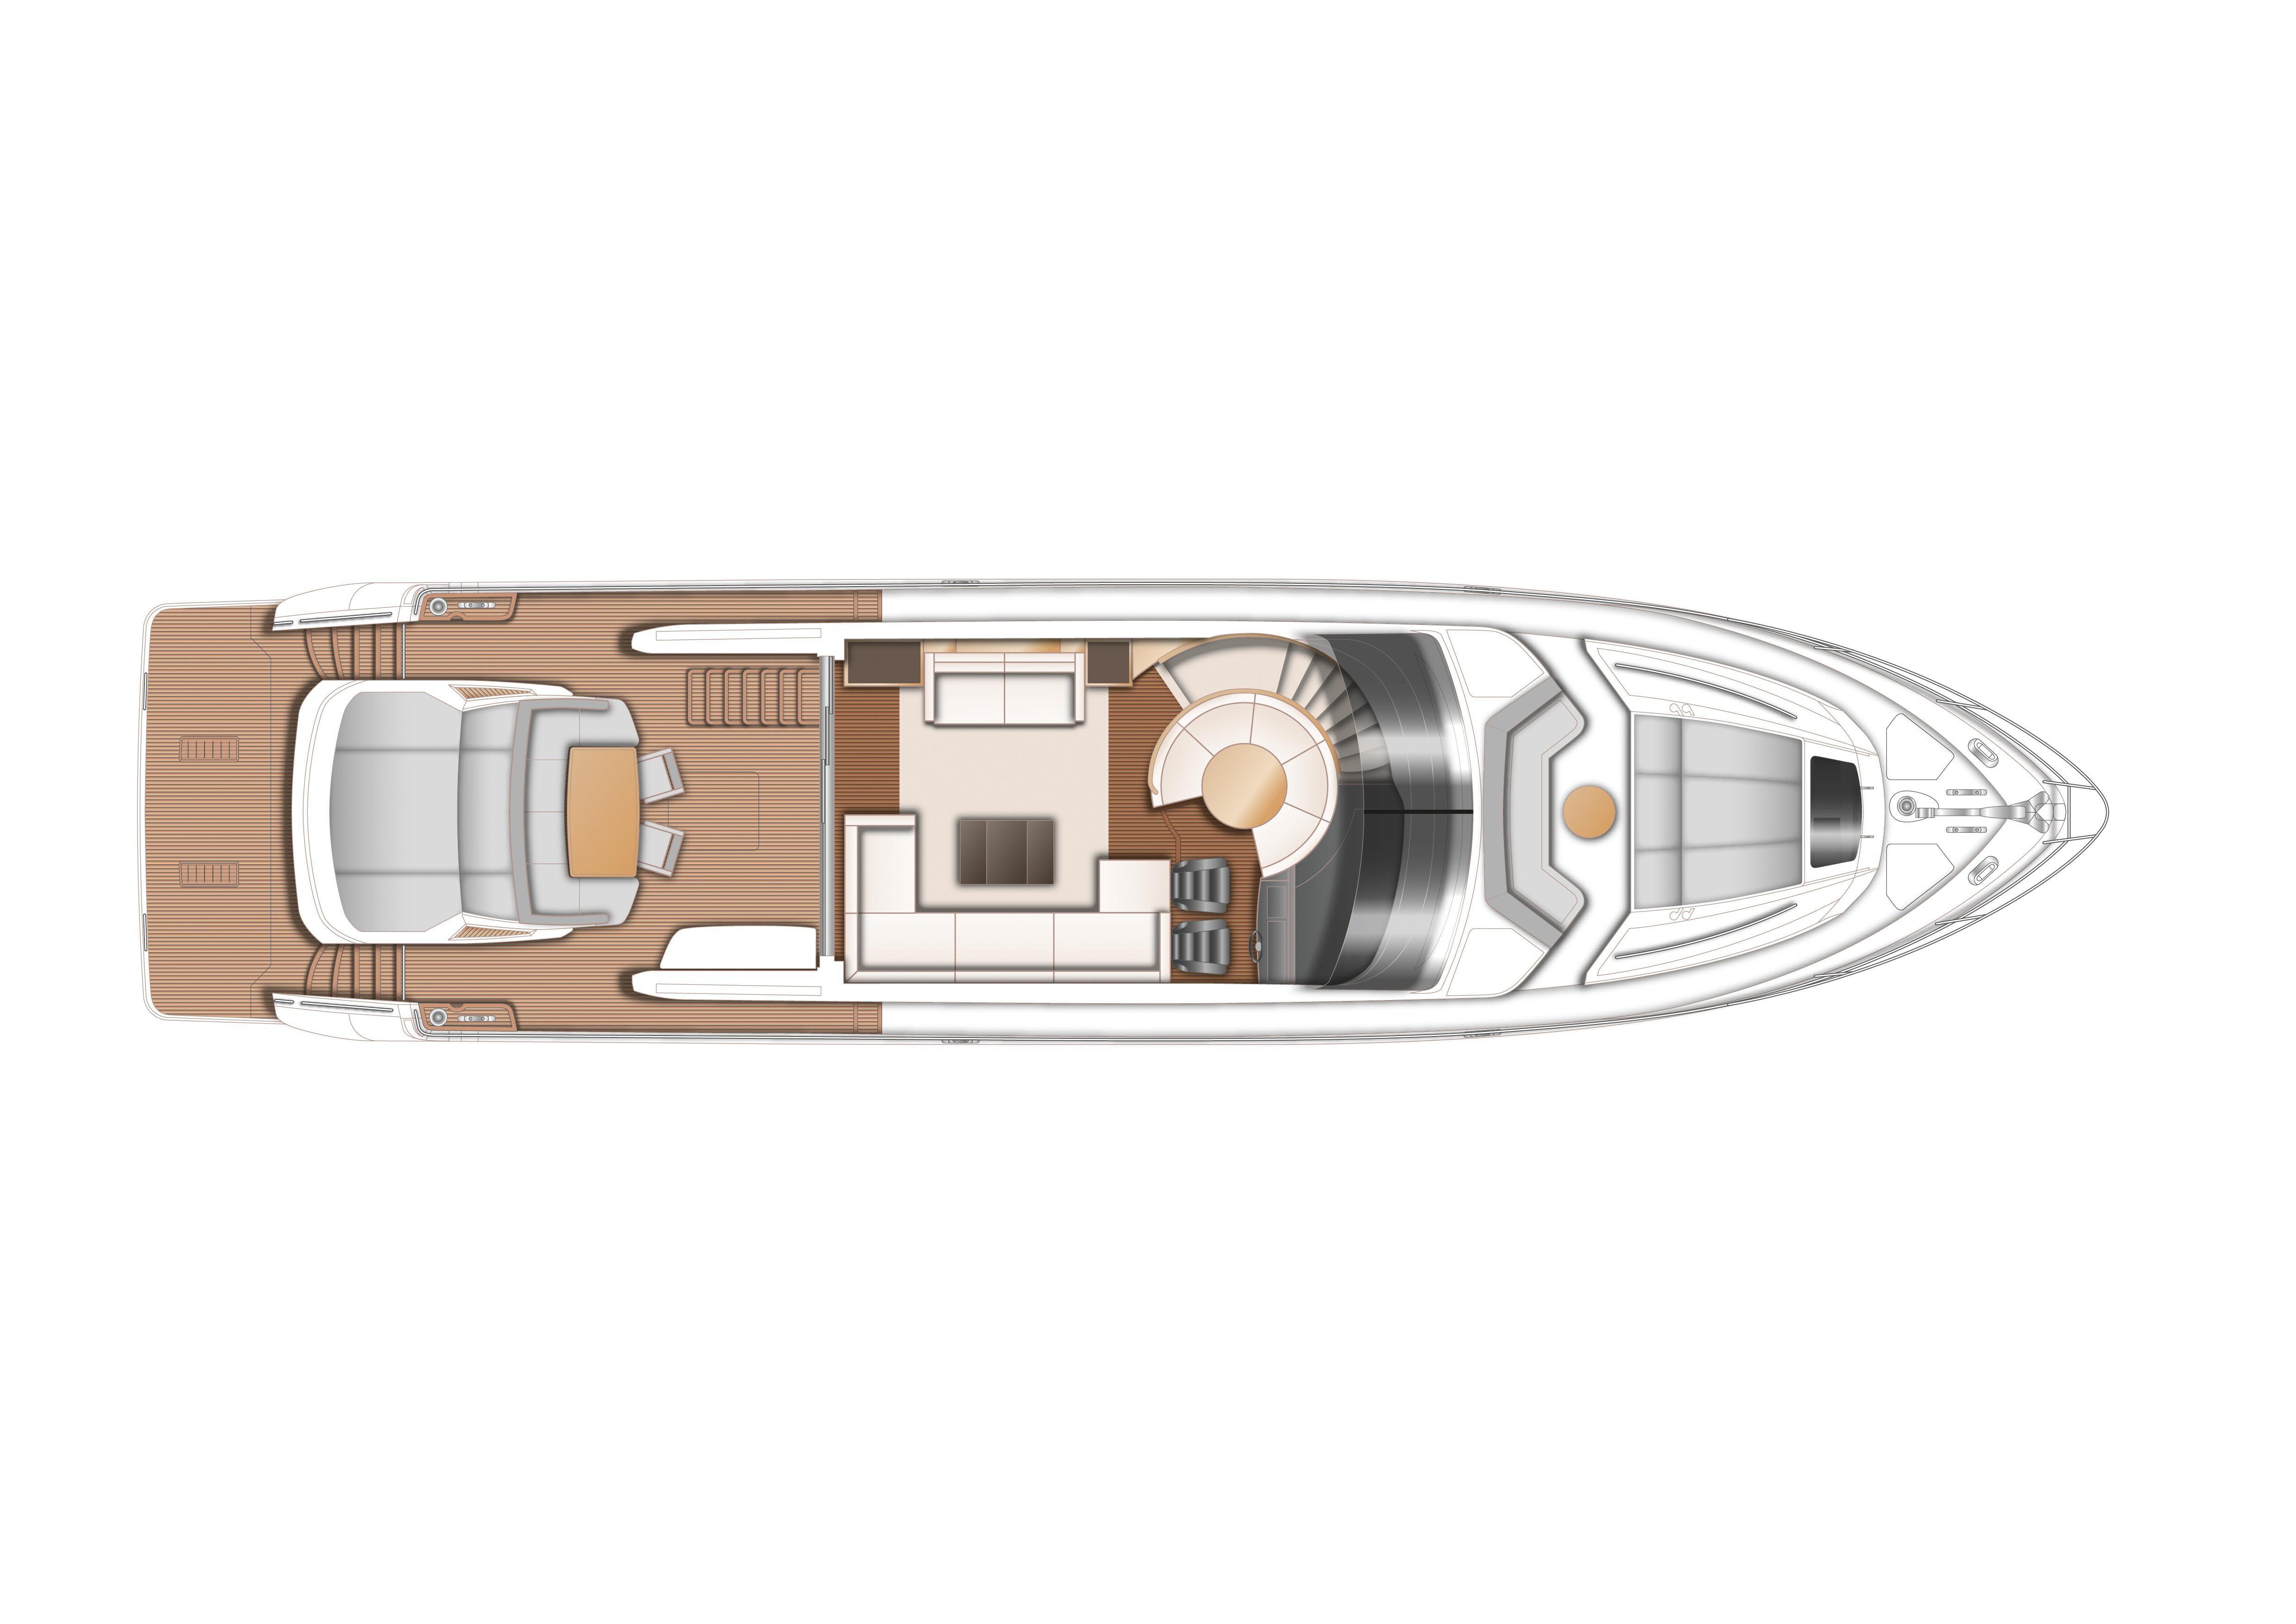 Manufacturer Provided Image: Princess S72 Upper Deck Layout Plan